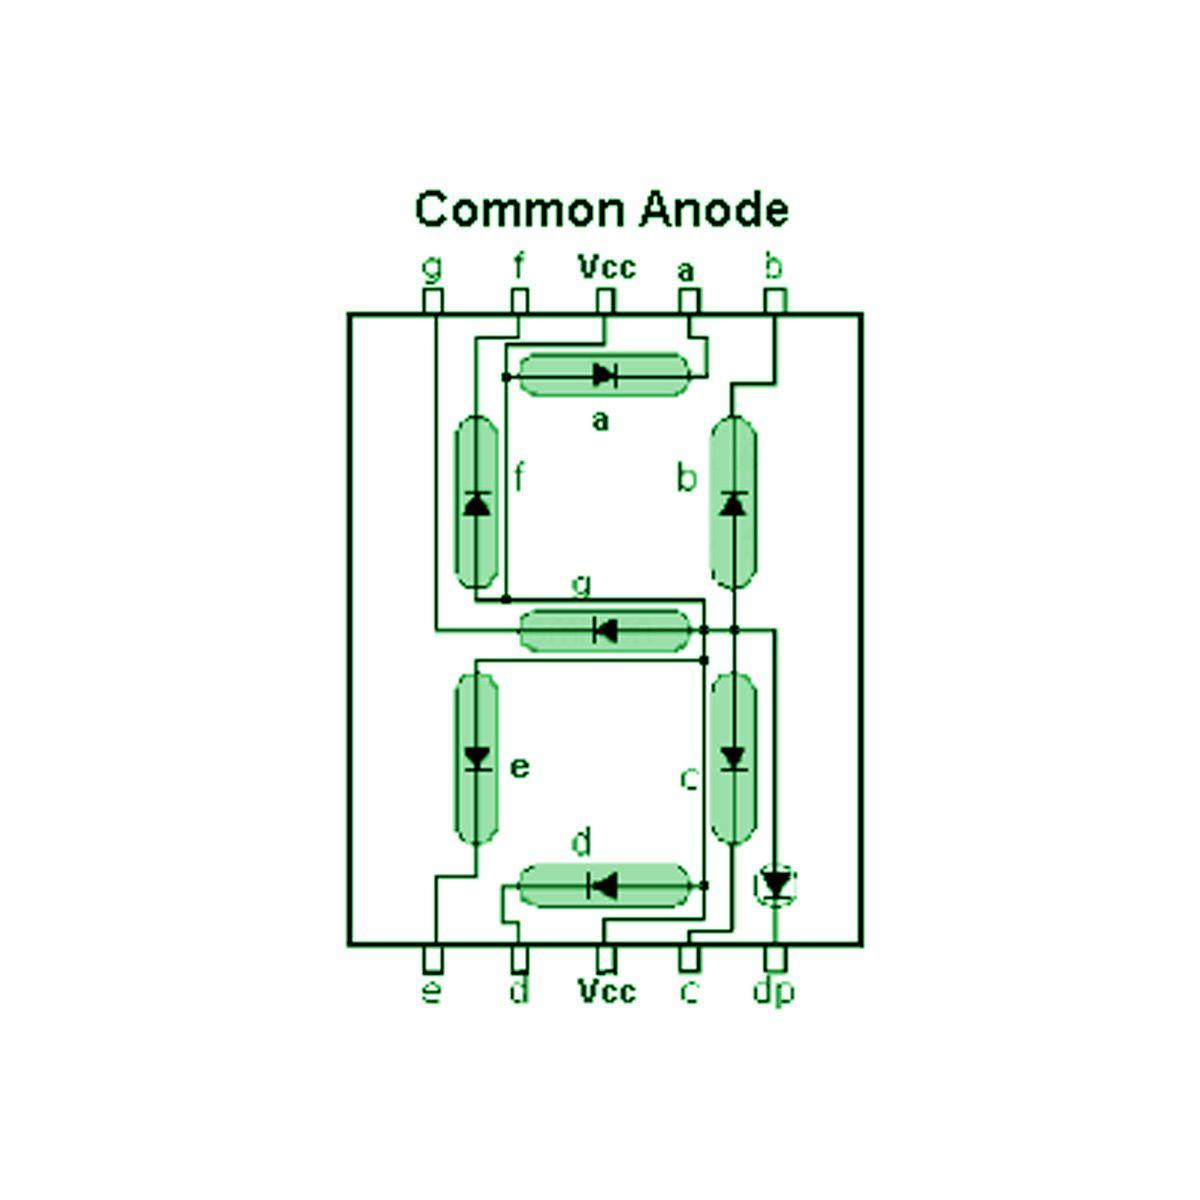 3x Display BCD 7 Segmento 1 Dígito Verde Ânodo Comum - 5161BG